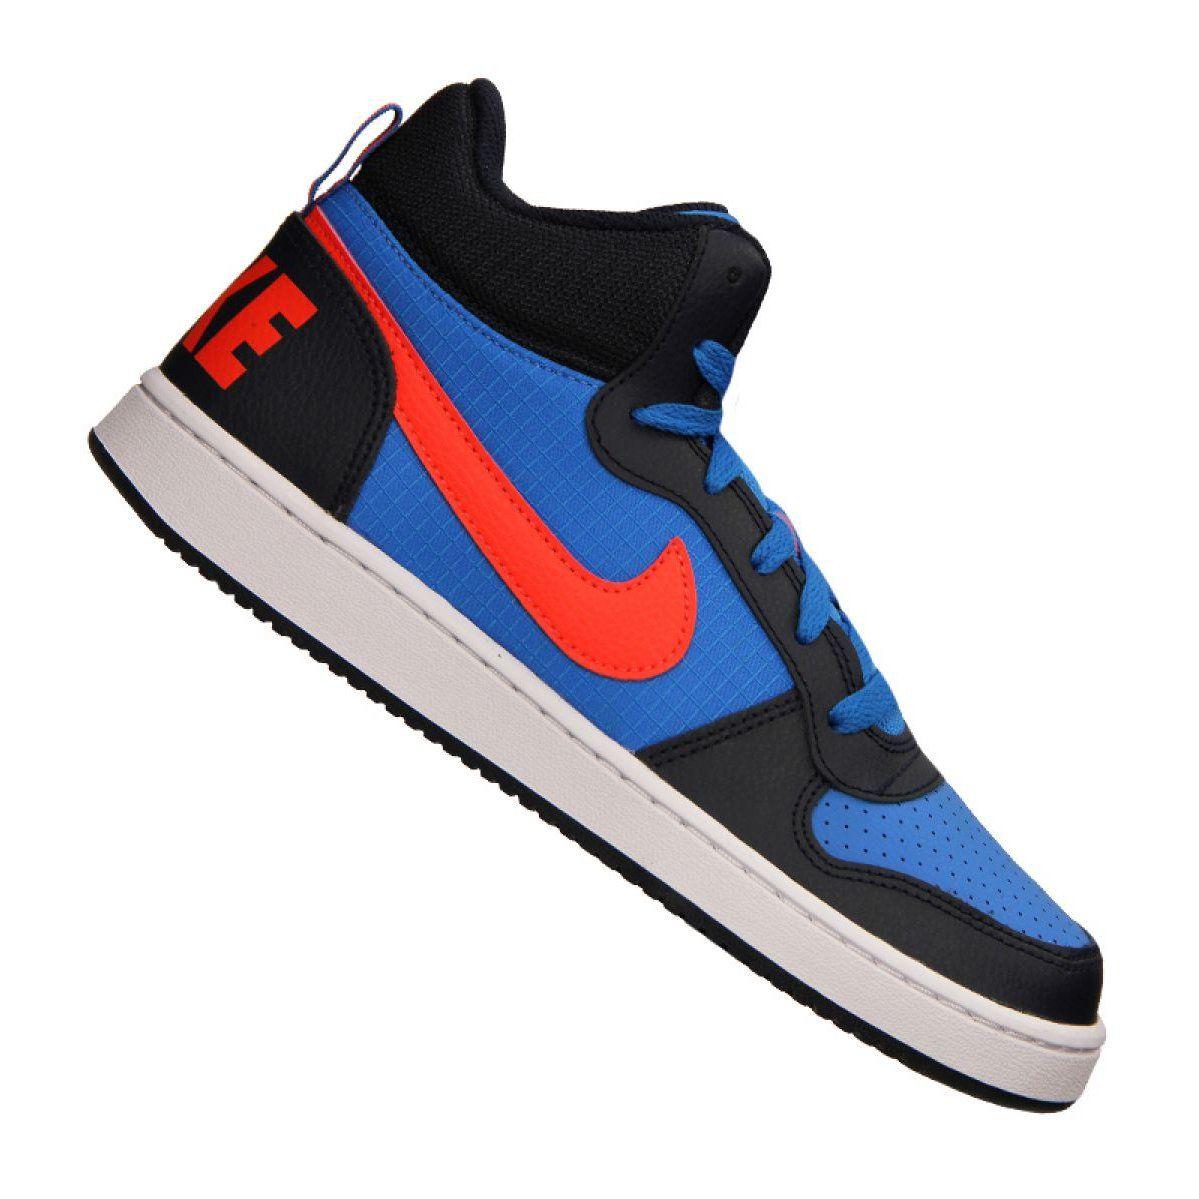 Buty Nike Court Borough Mid Jr 839977 403 Niebieskie Wielokolorowe Blue Shoes Junior Shoes Youth Running Shoes